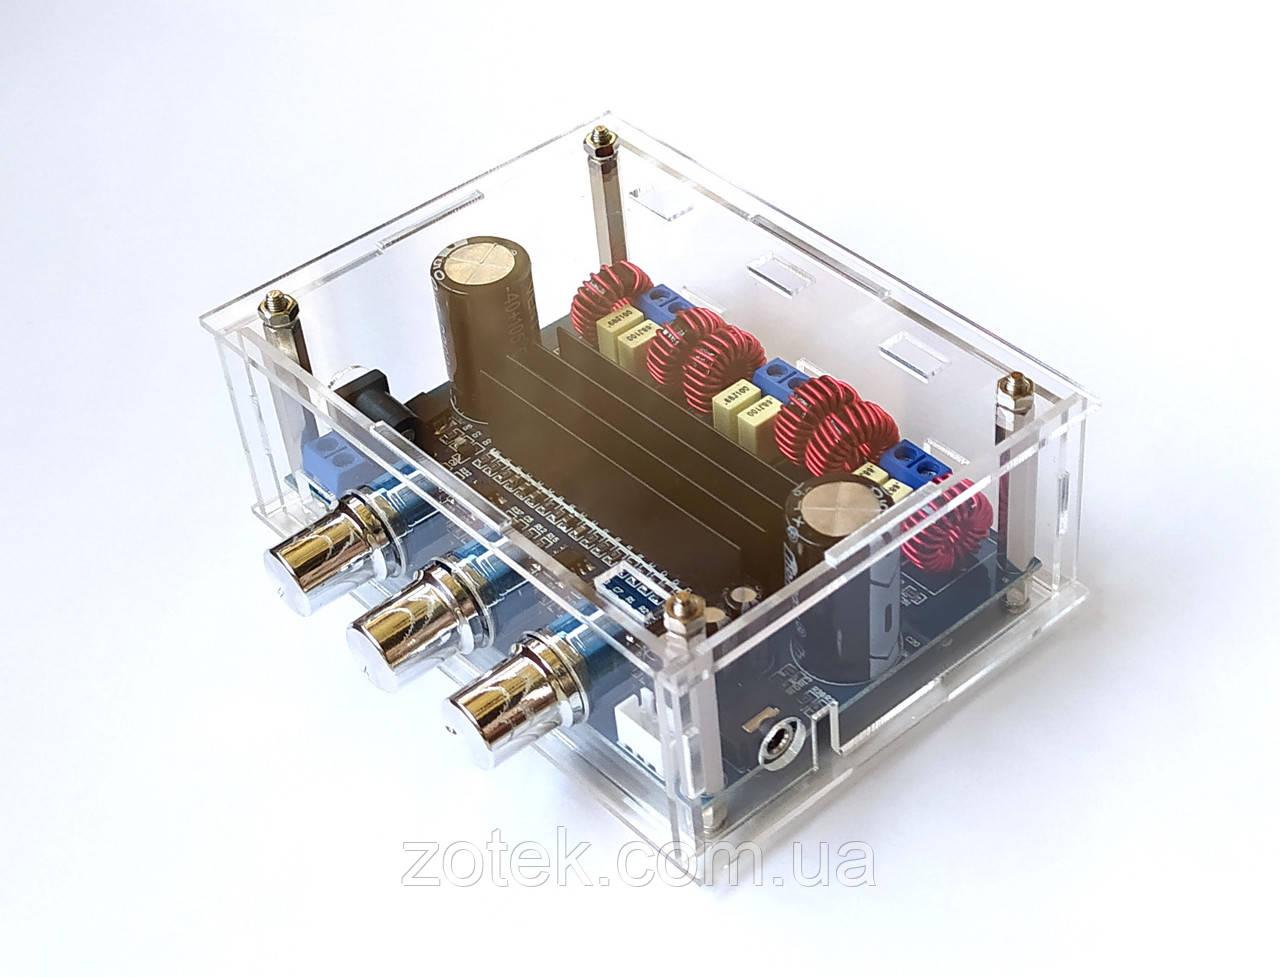 Аудио усилитель мощности XH-M139 SMD С КОРПУСОМ - TPA3116D2 50Вт*2+100Вт 2.1 DC 8-24В